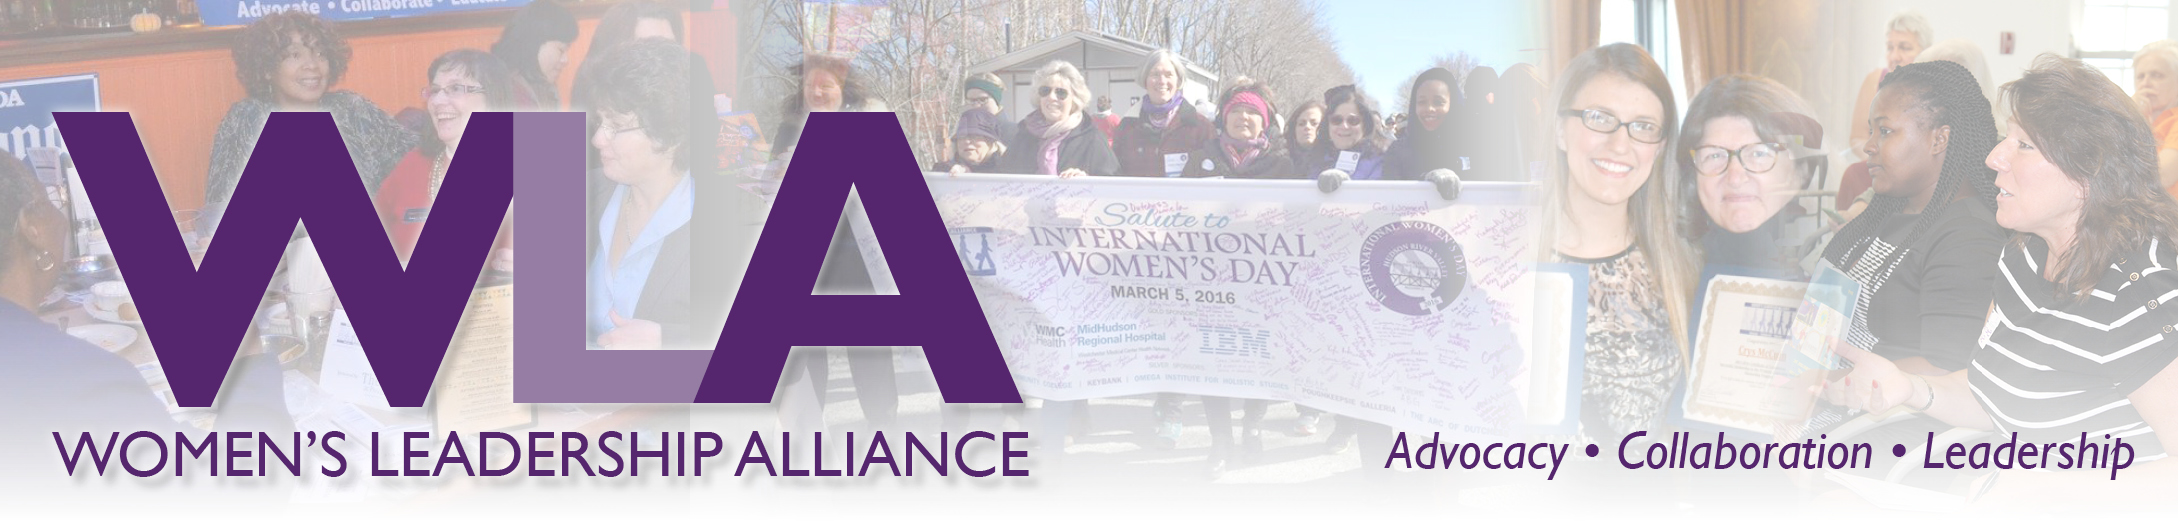 Women's Leadership Alliance